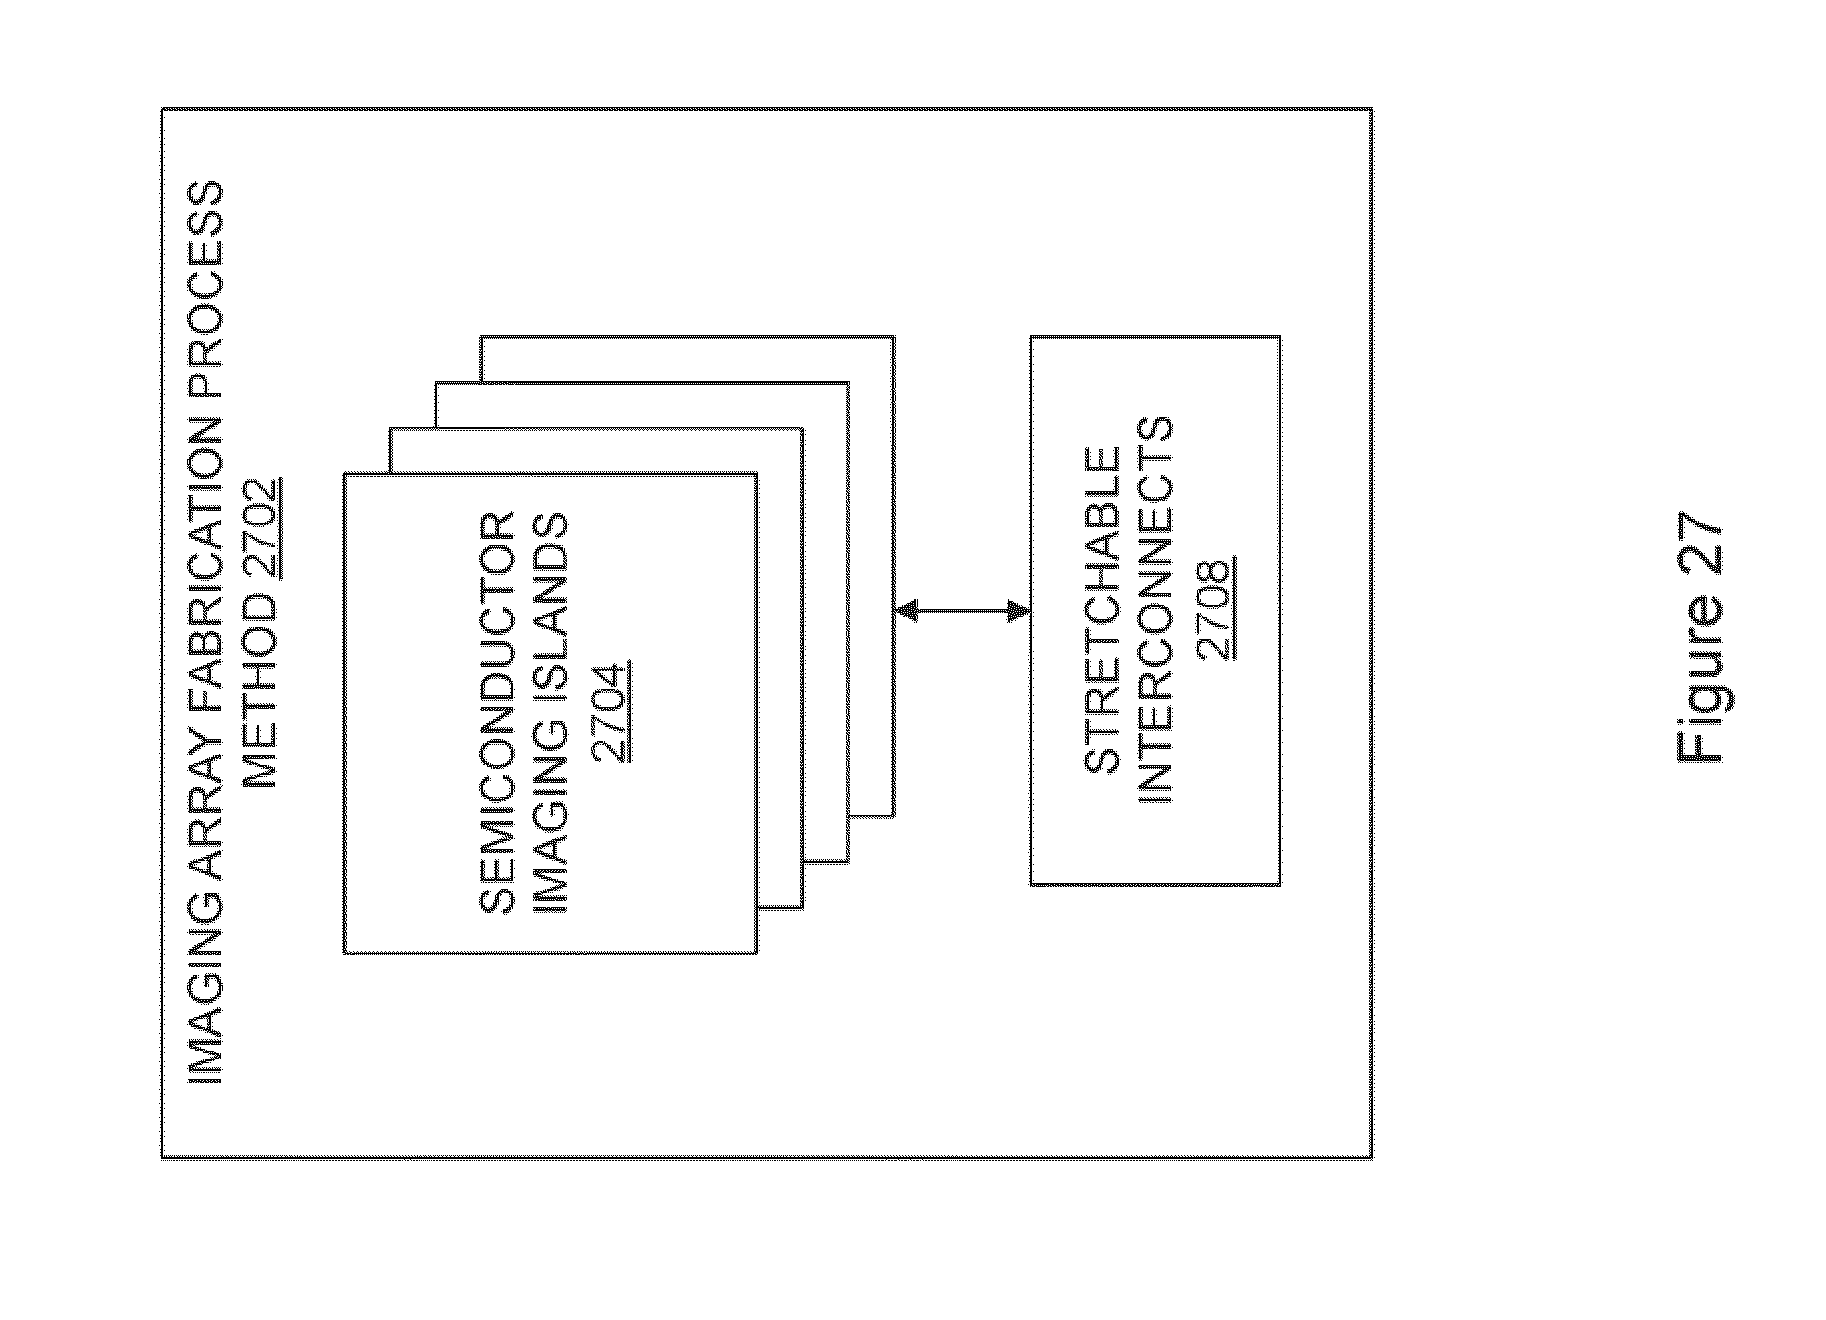 Idec Rssan-50a Wiring Diagram